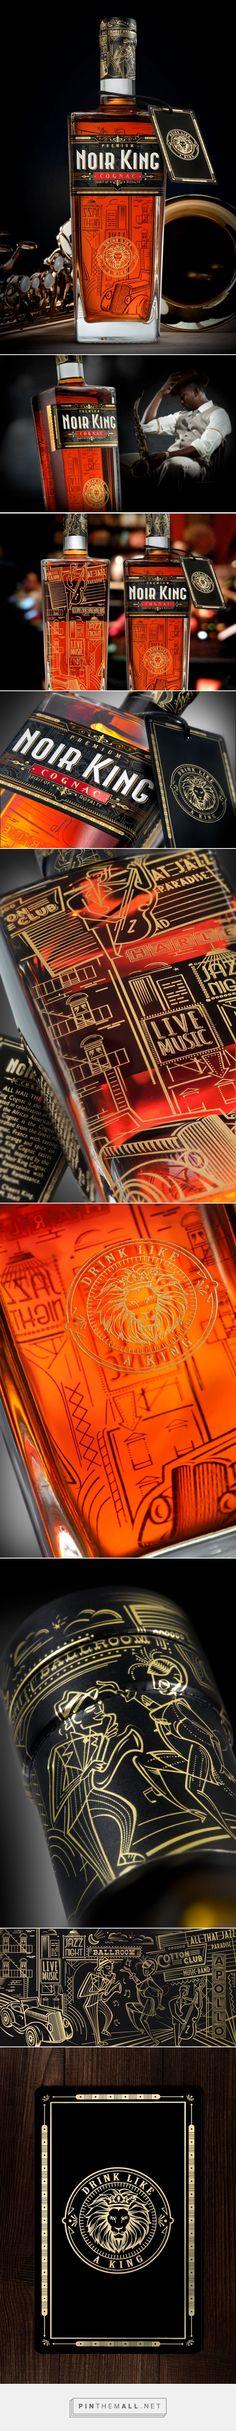 Noir King Cognac - The Harlem Renaissance - Packaging of the World - Creative Package Design Gallery - http://www.packagingoftheworld.com/2017/06/noir-king-cognac-harlem-renaissance.html - created via https://pinthemall.net